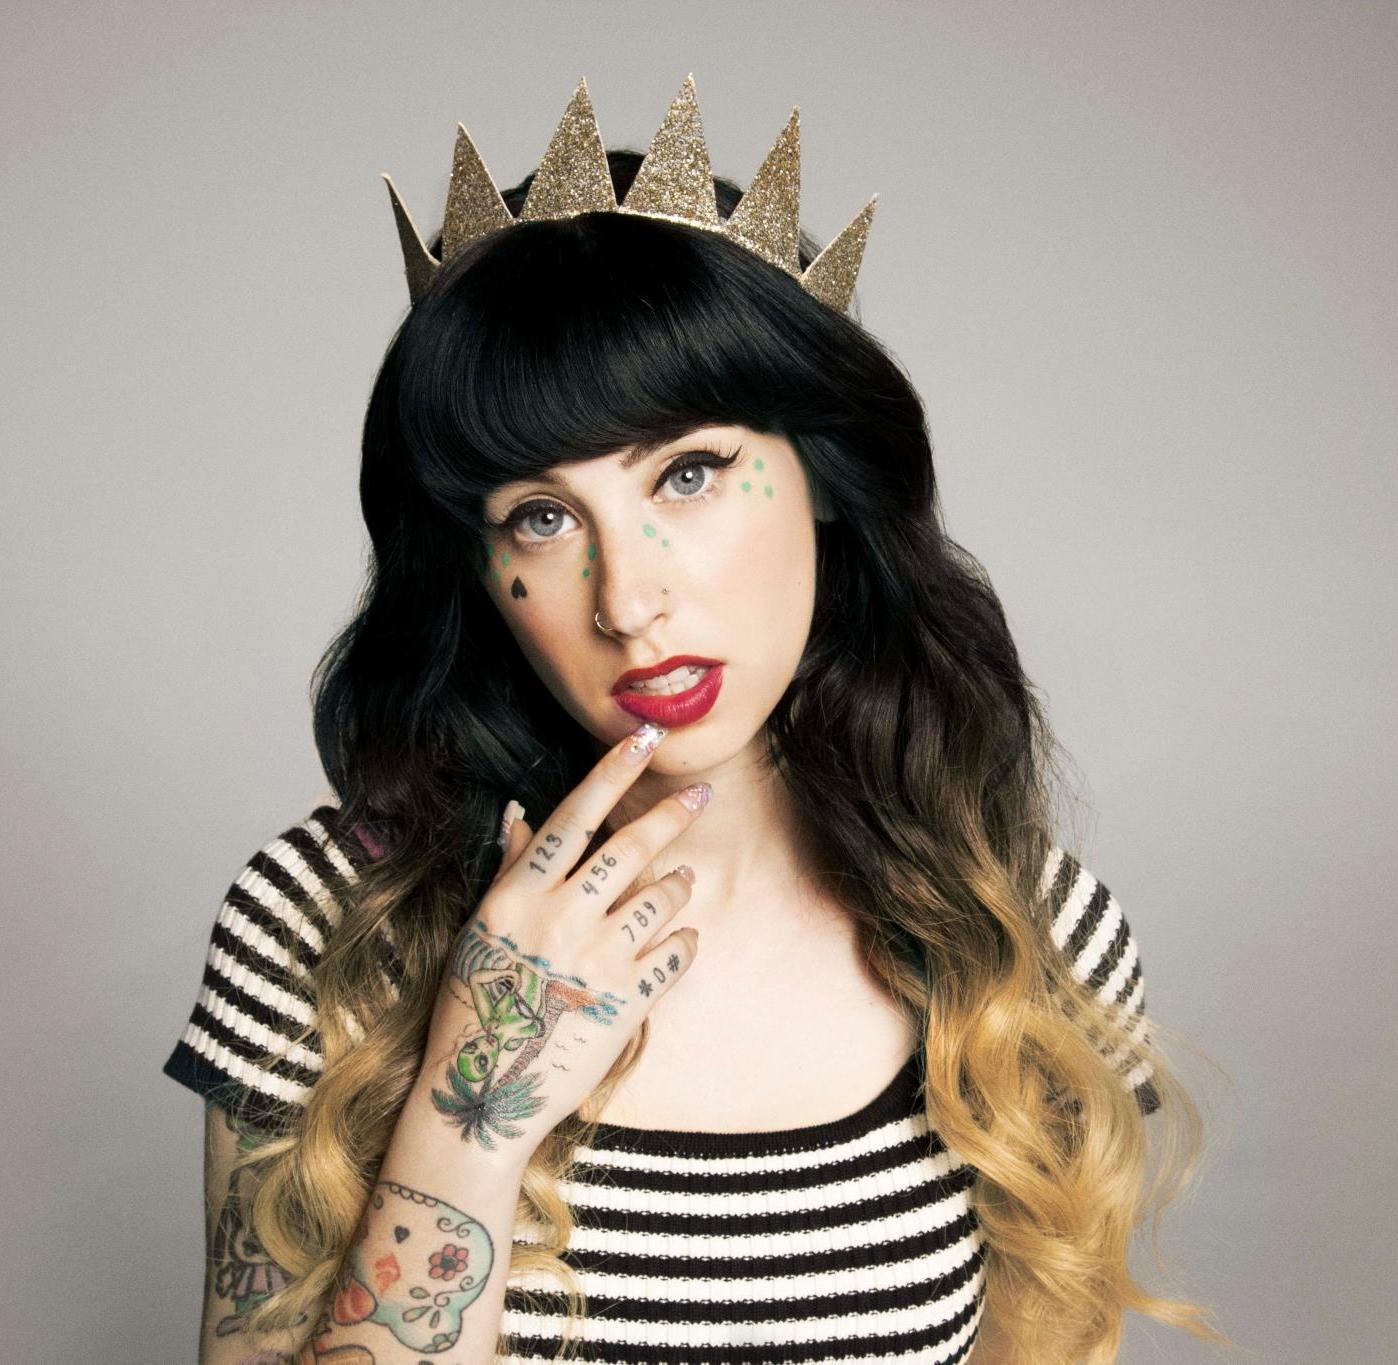 Kreayshawn | Music Hot Hits | Hip hop singers, Wonder woman, Music